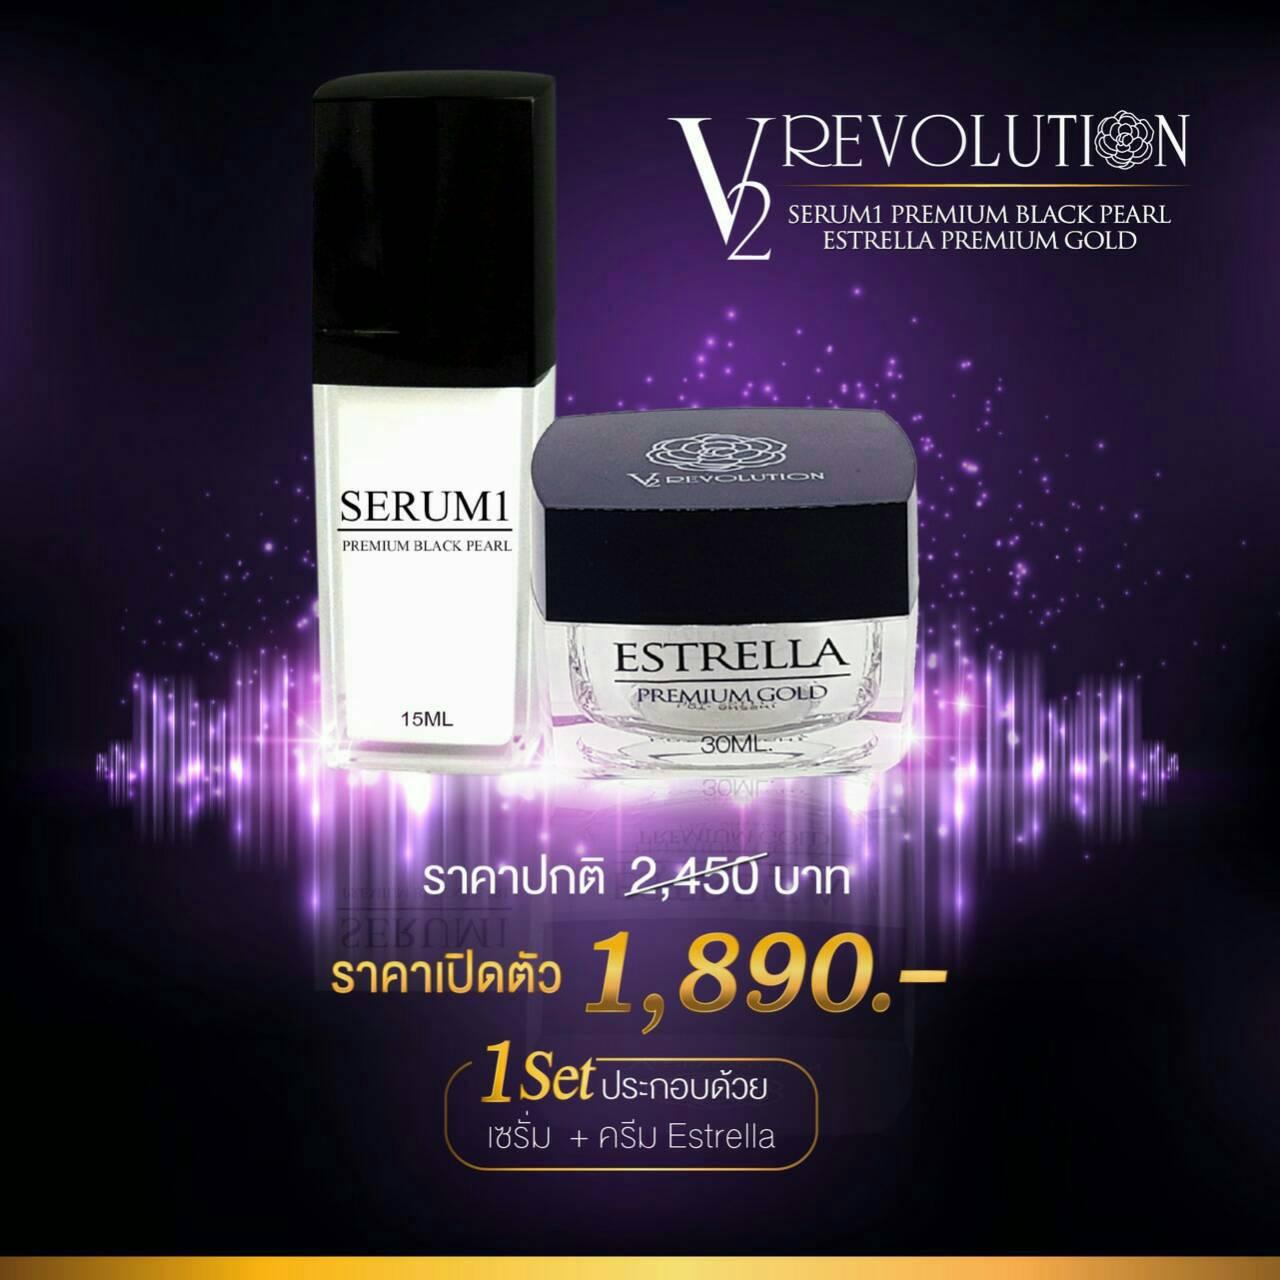 V2 Revolution Serum1 premium Black Pearl Estrella Premium Gold SET